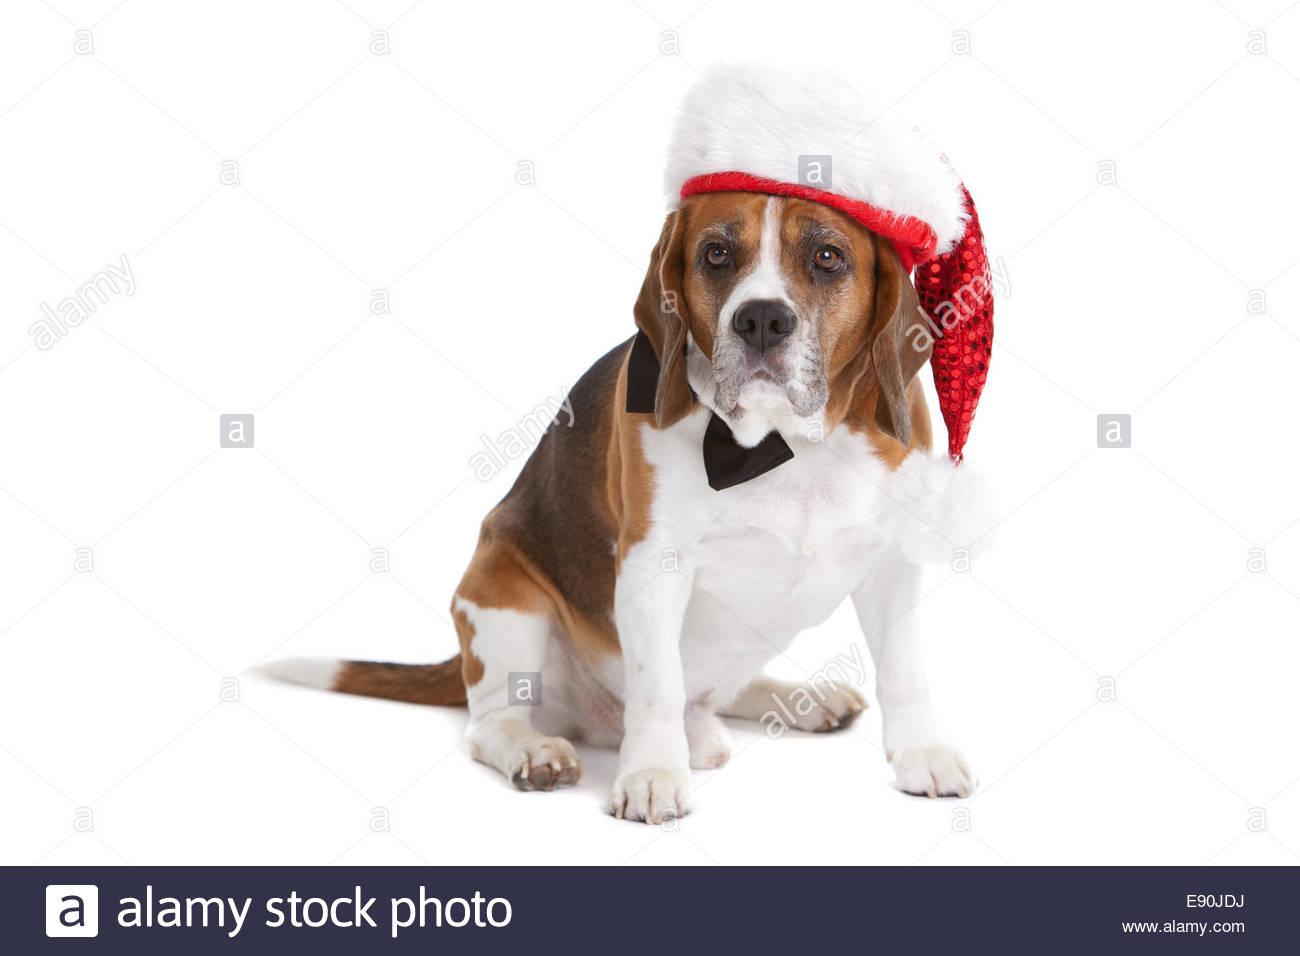 Cute beagle in christmas spirit stock photo royalty free image cute beagle in christmas spirit voltagebd Gallery